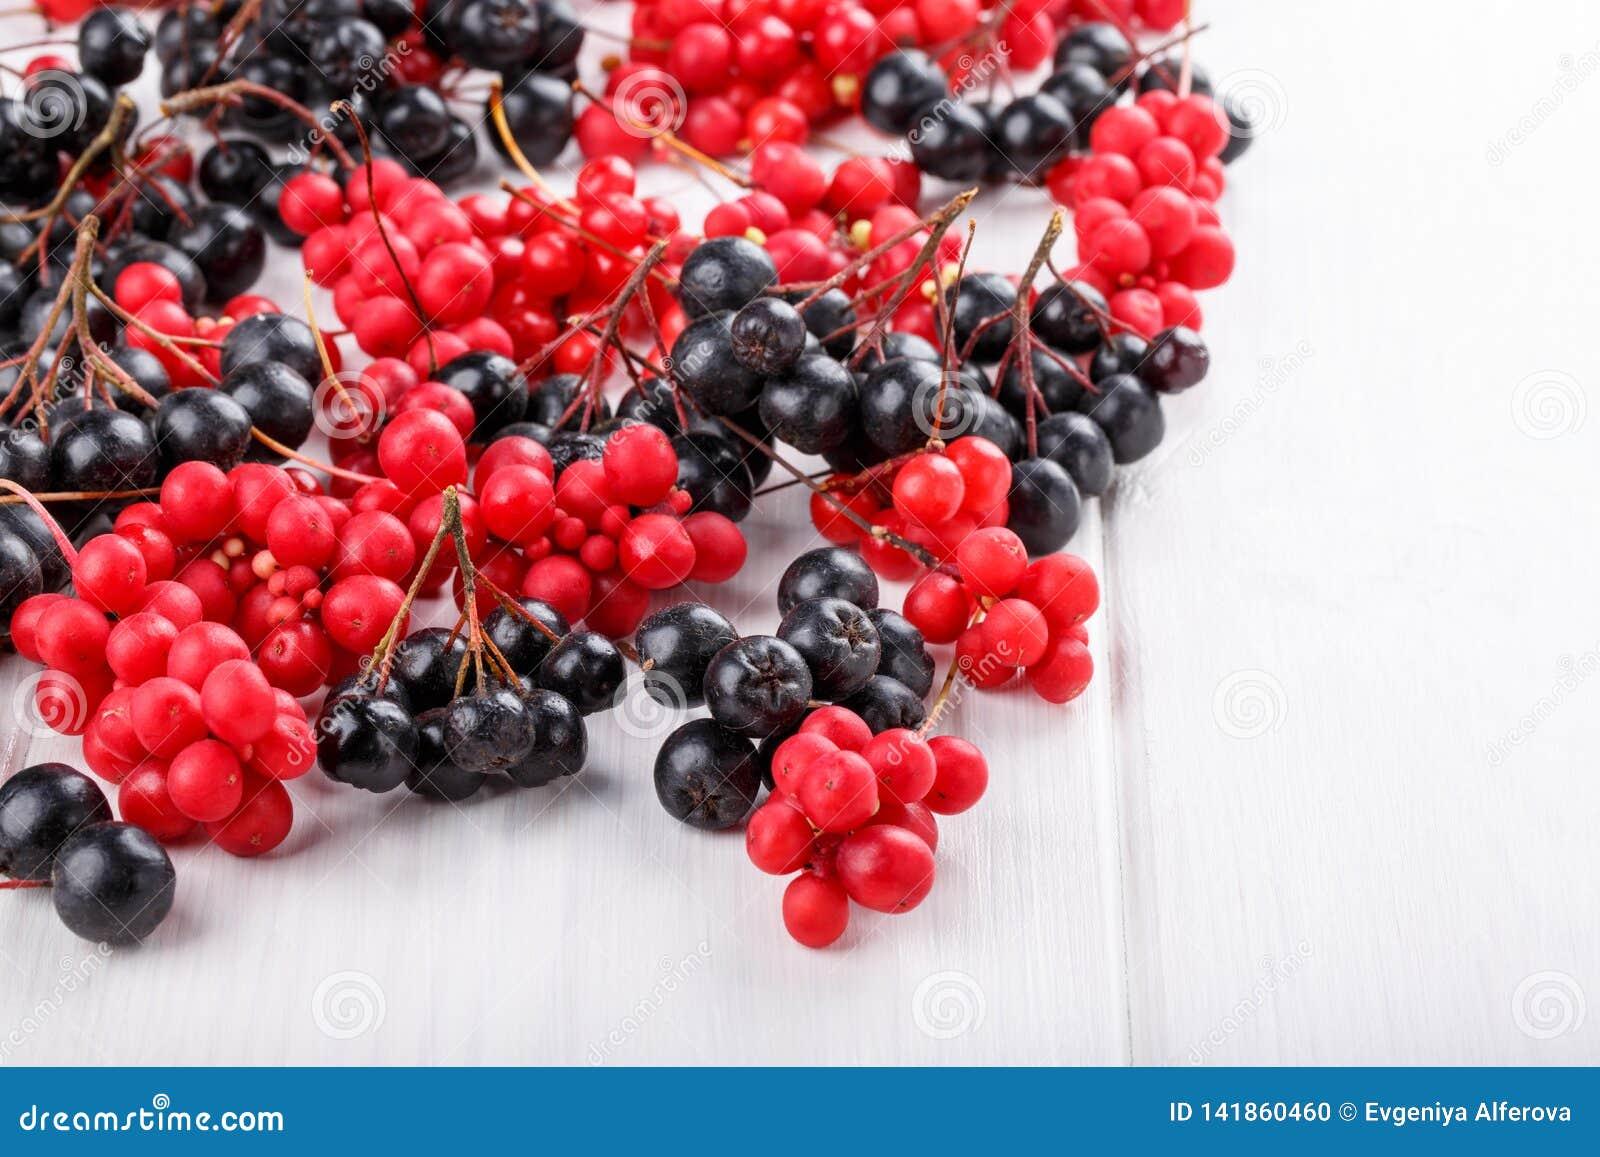 Schisandra chinensis o baya del cinco-sabor Aronia o chokeberry